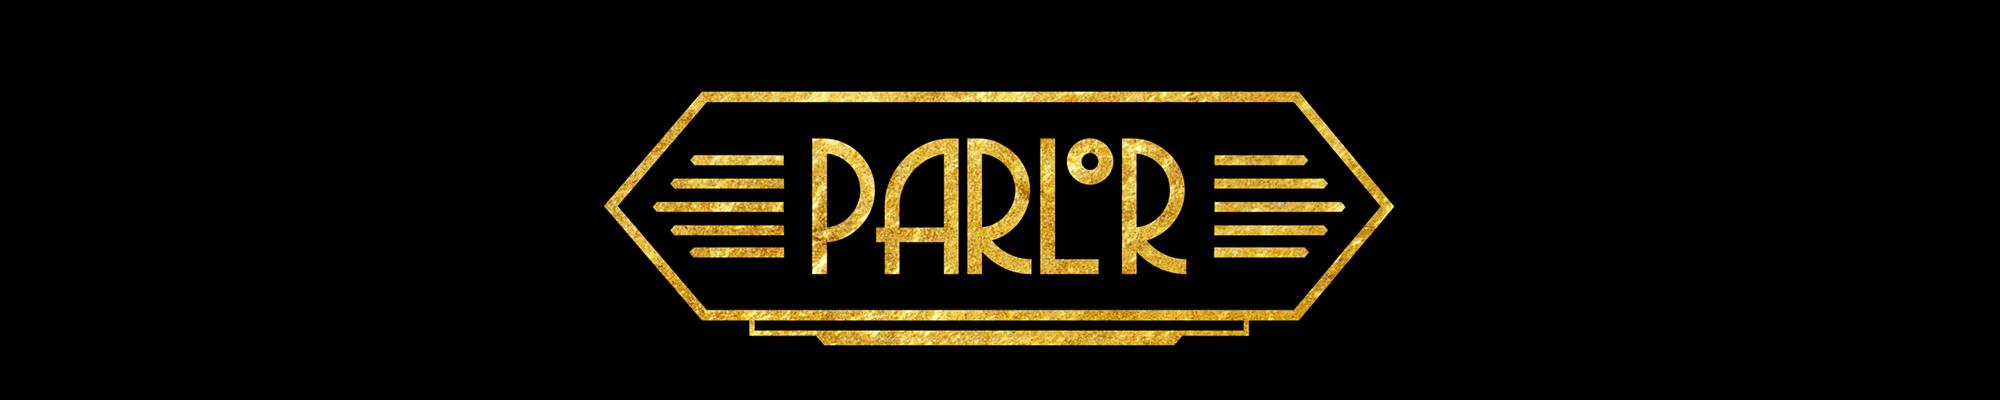 PARLOR